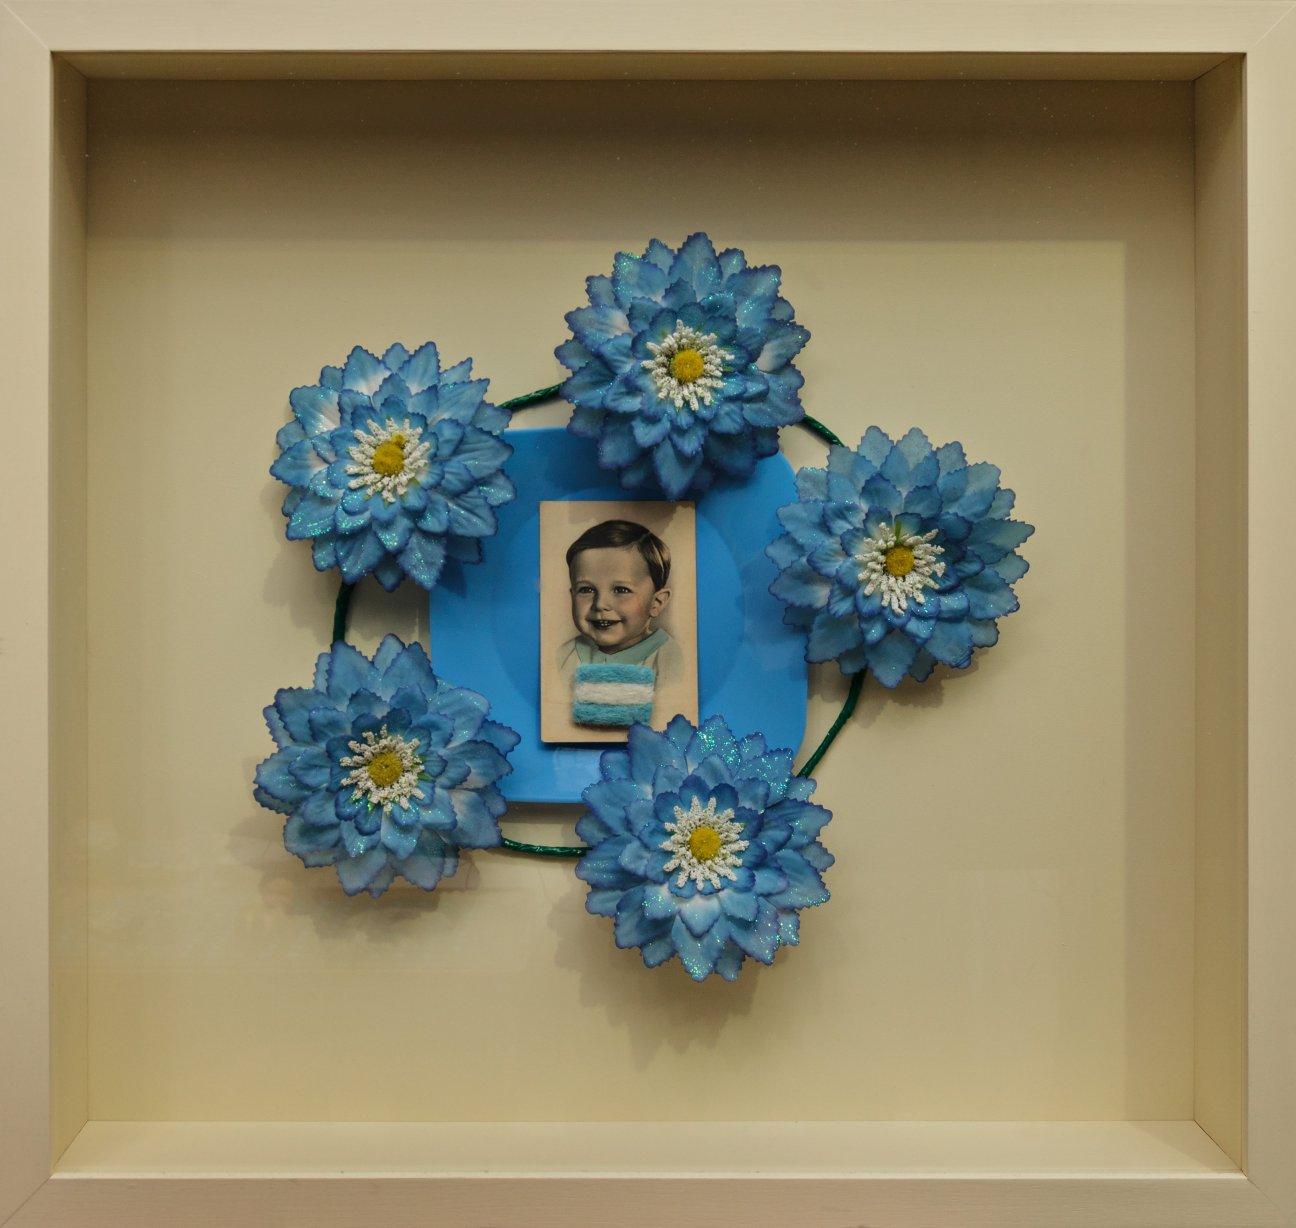 Tal para cual - Objetos ensamblados, 65 cm x 69 cm 2007